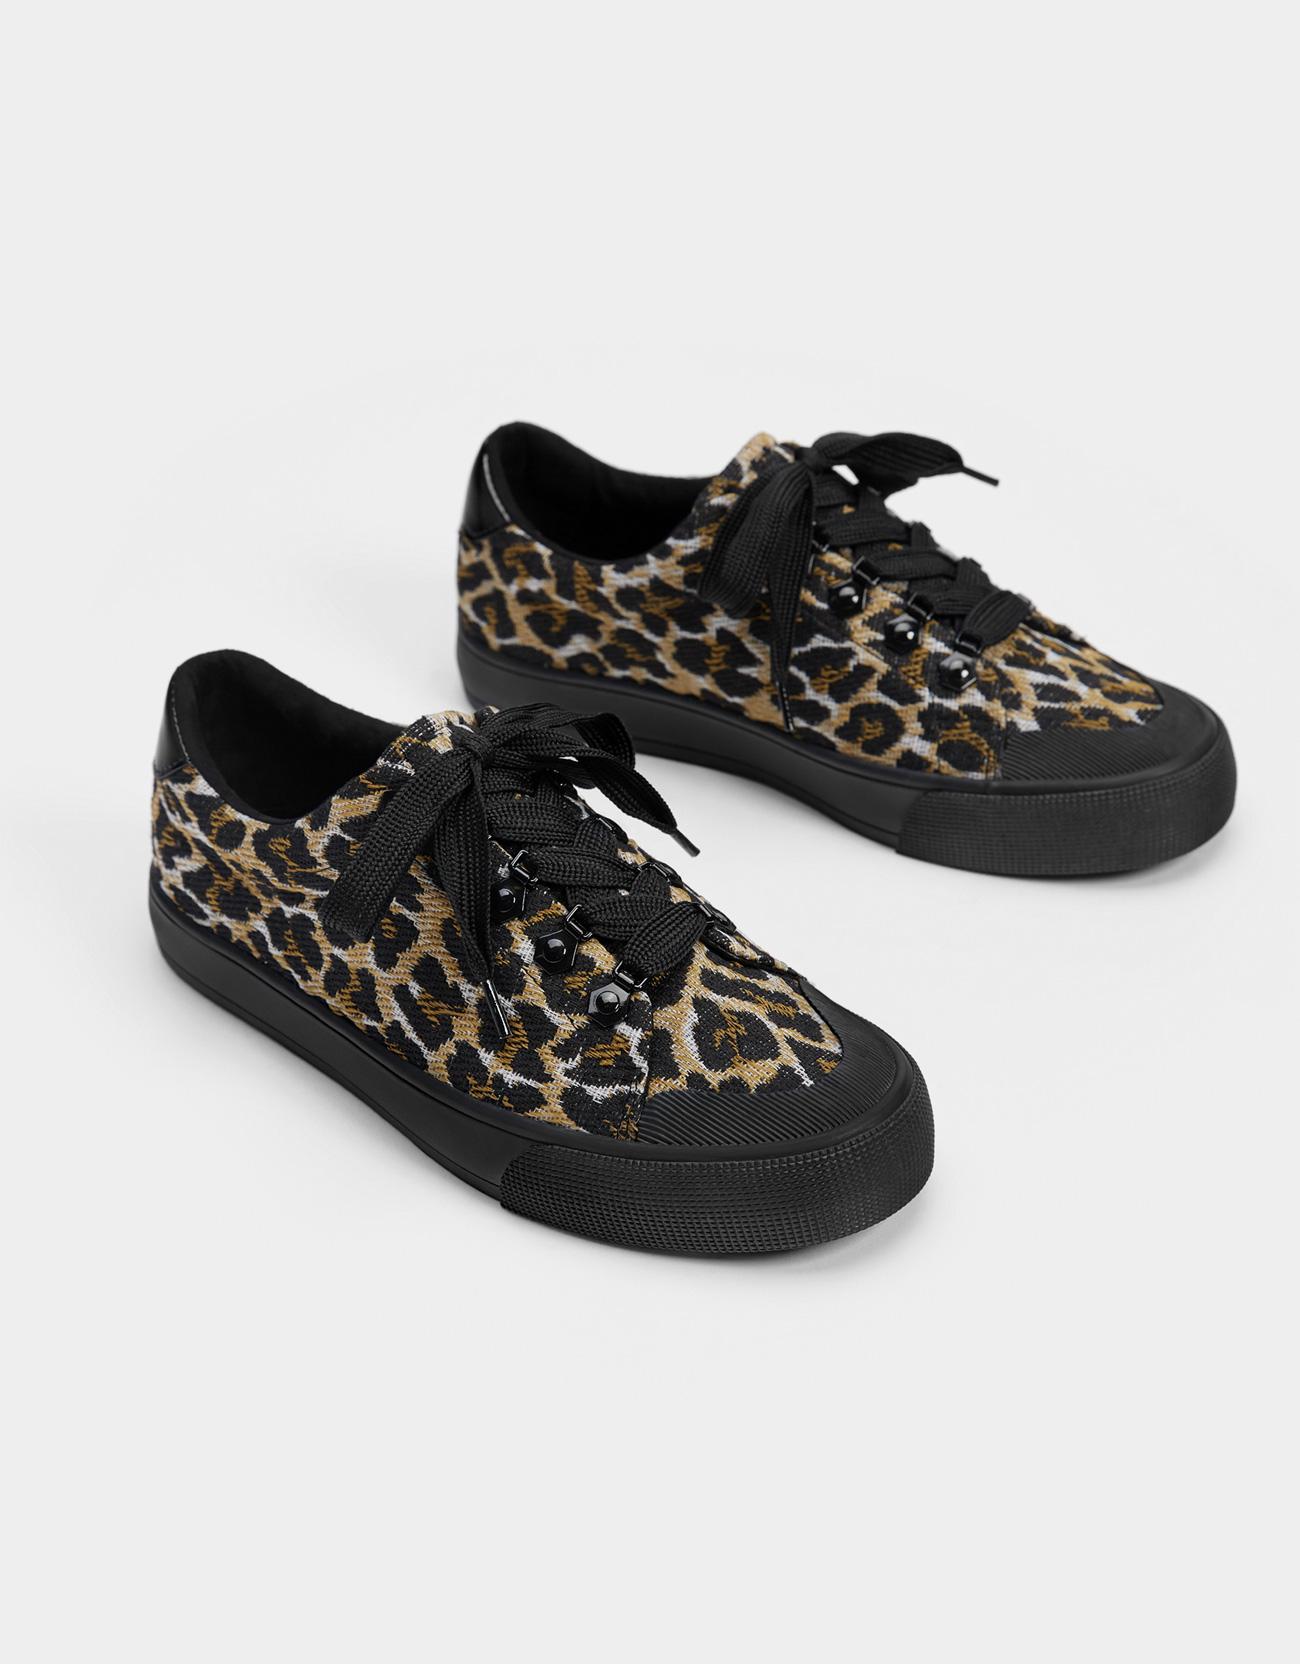 c721f3959df5 Animal print trainers - Shoes - Bershka United States